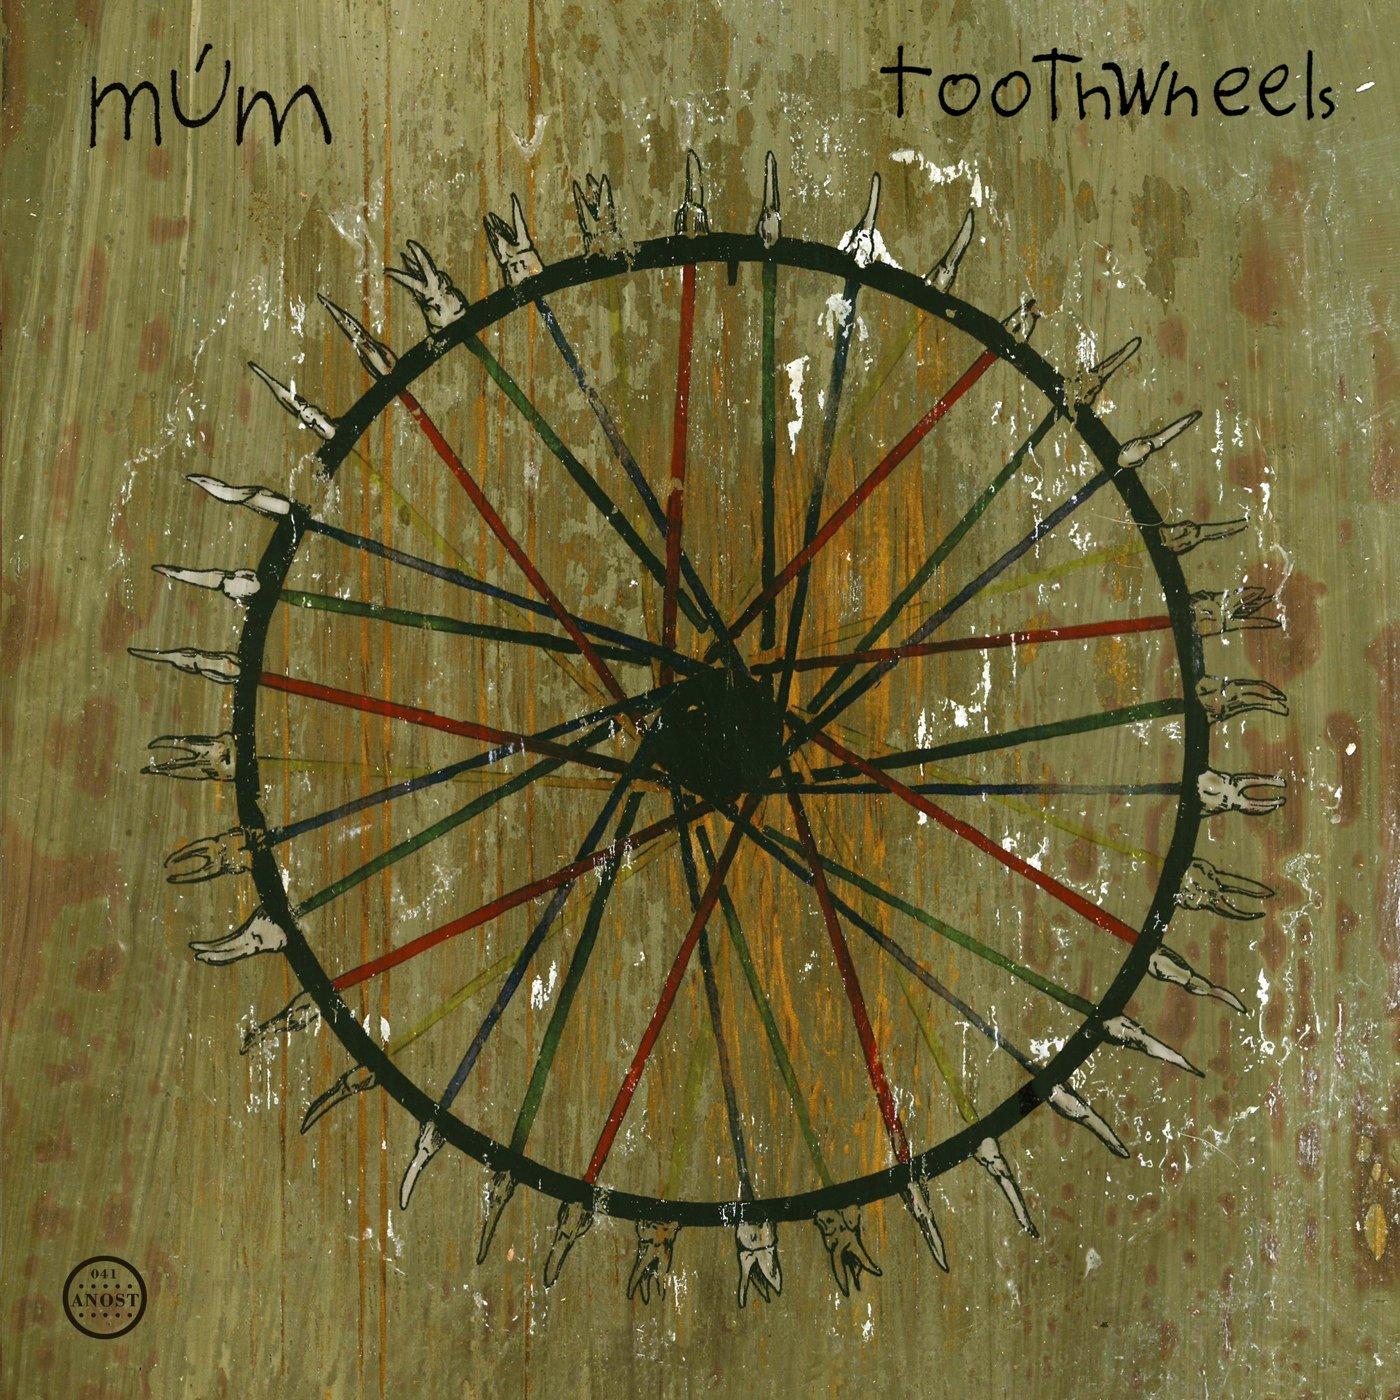 Toothwheels [Analog]                                                                                                                                                                                                                                                    <span class=